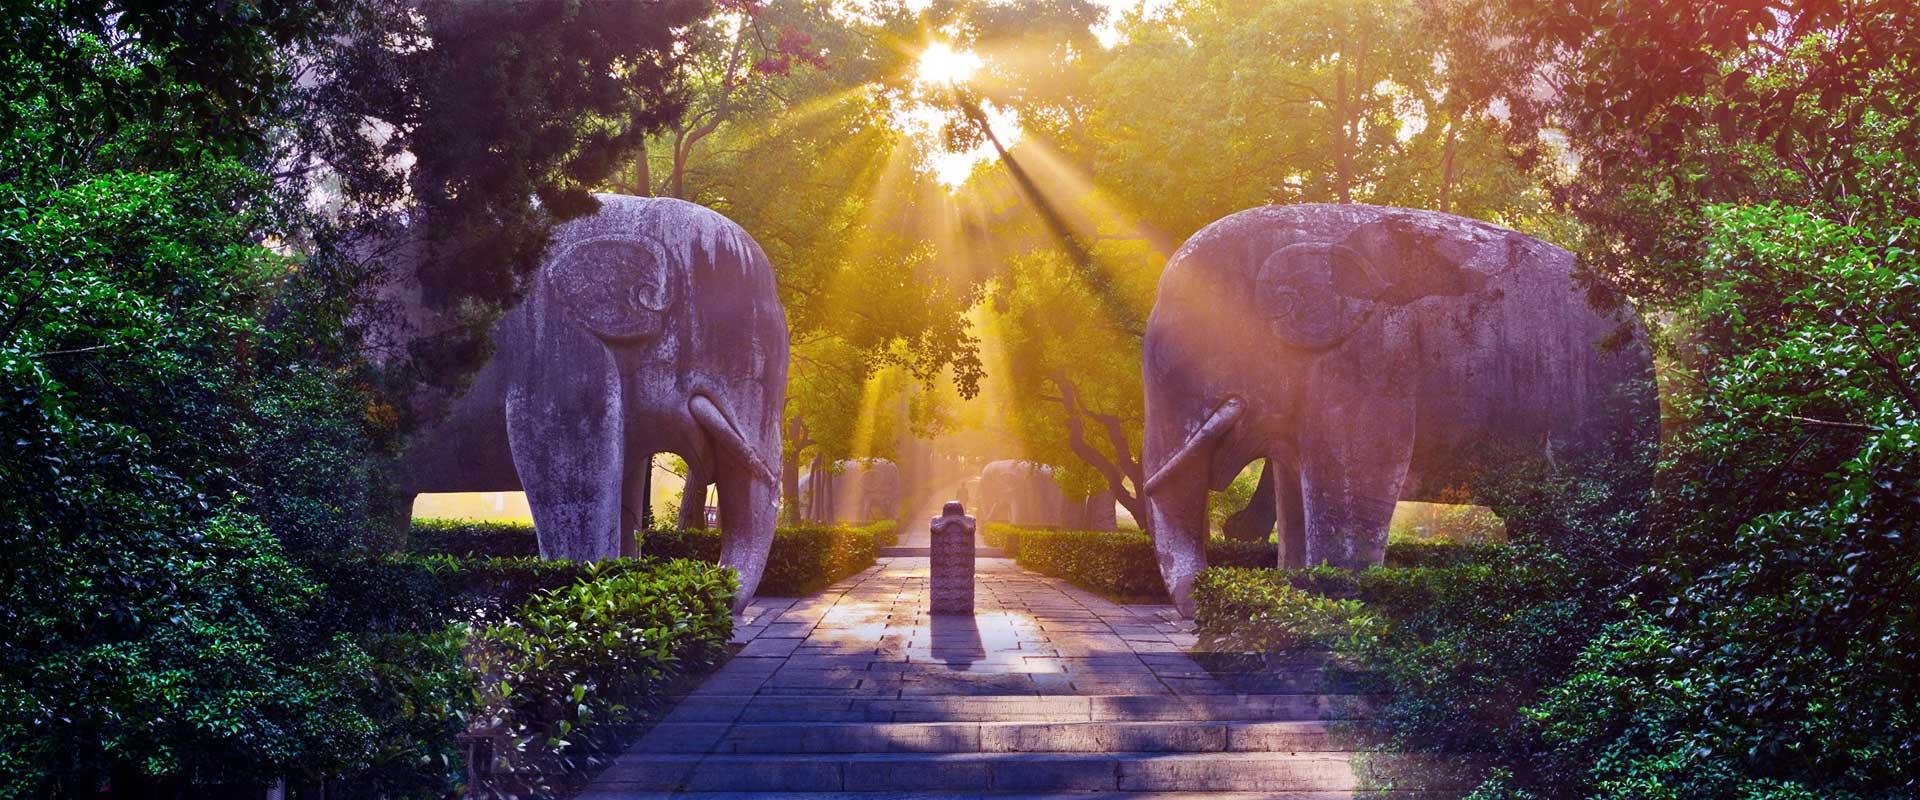 https://ru.gonanjingchina.com/sites/default/files/nanjing-travel-ming-tomb.jpg